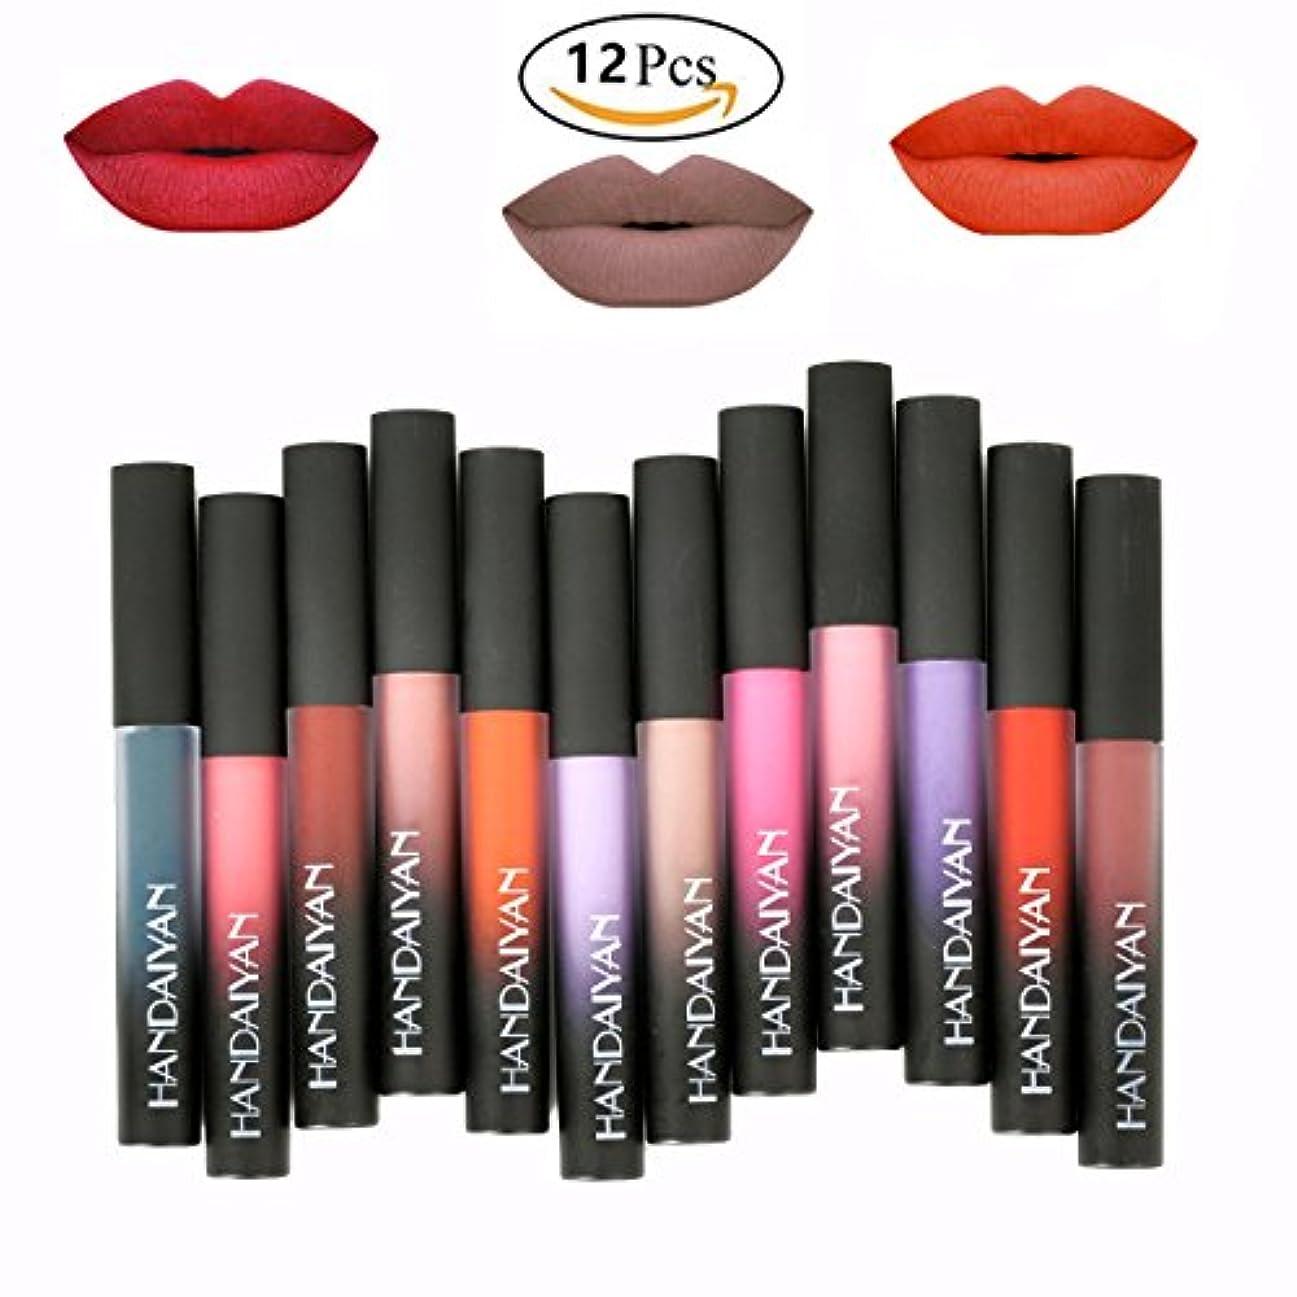 12 Colors Waterproof Long Lasting Durable Matte Liquid Lipstick Beauty Lip Gloss | Sexy Fashionable Colors Lipsticks...